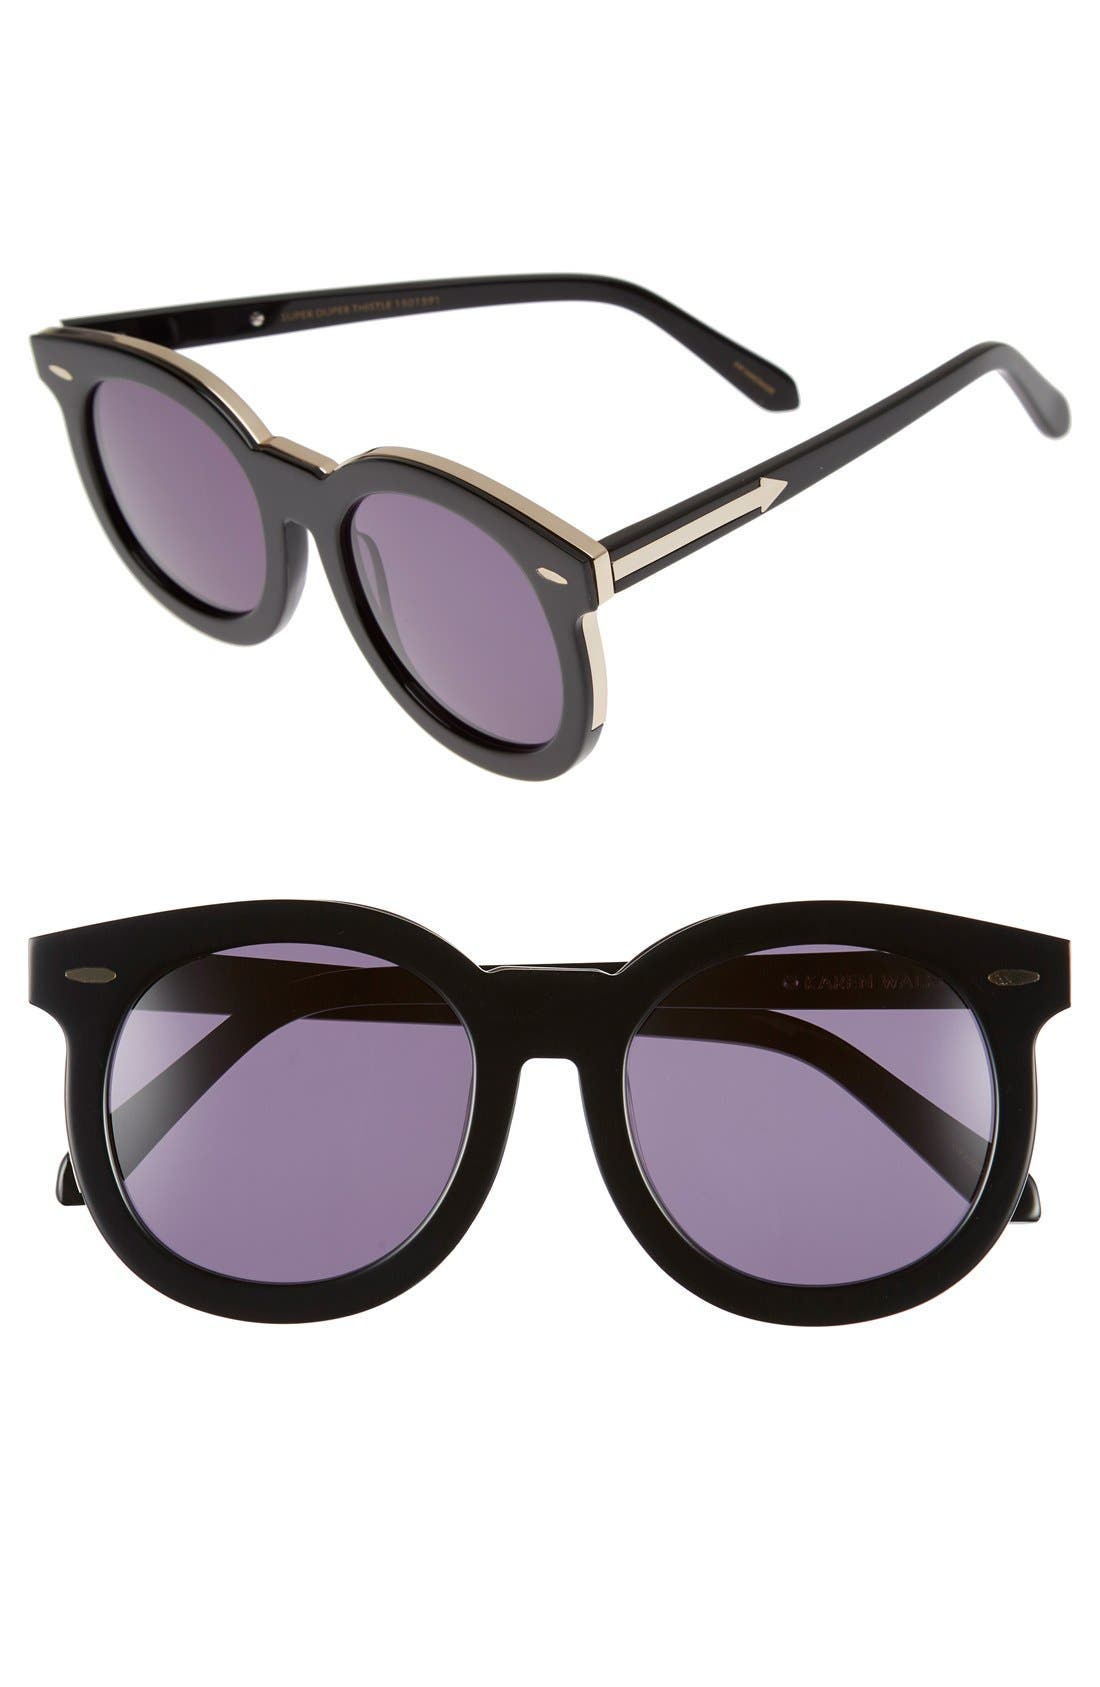 Main Image - Karen Walker 'Super Duper Thistle' 52mm Retro Sunglasses